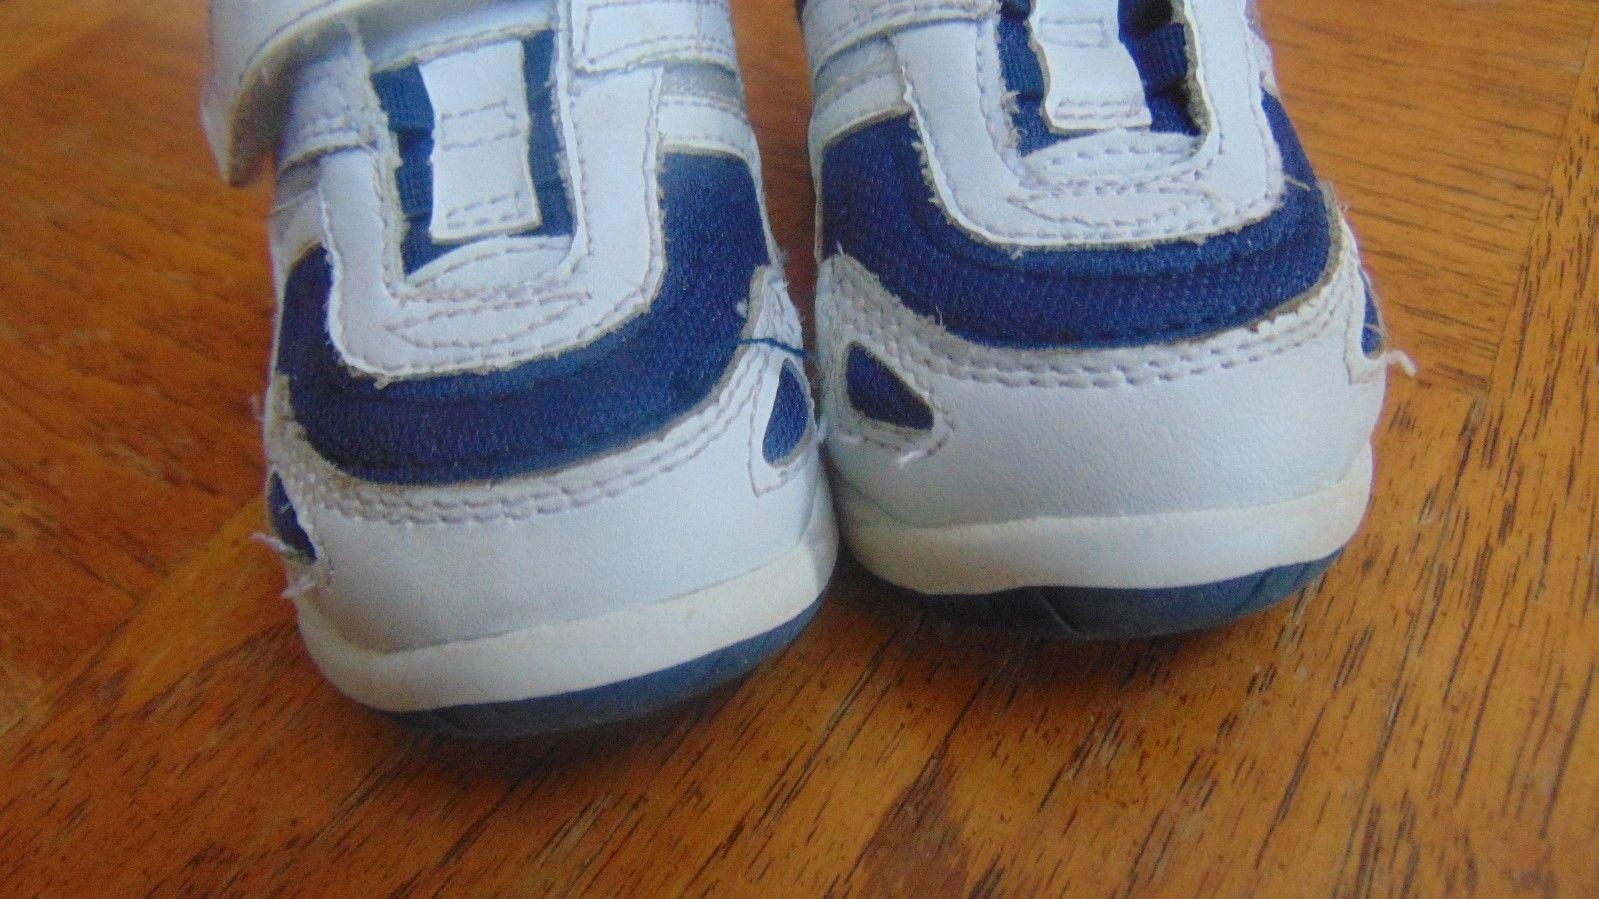 Champion White & Blue Tennis Shoe Unisex Size 3W-Velcro-Man Made & Leather Upper